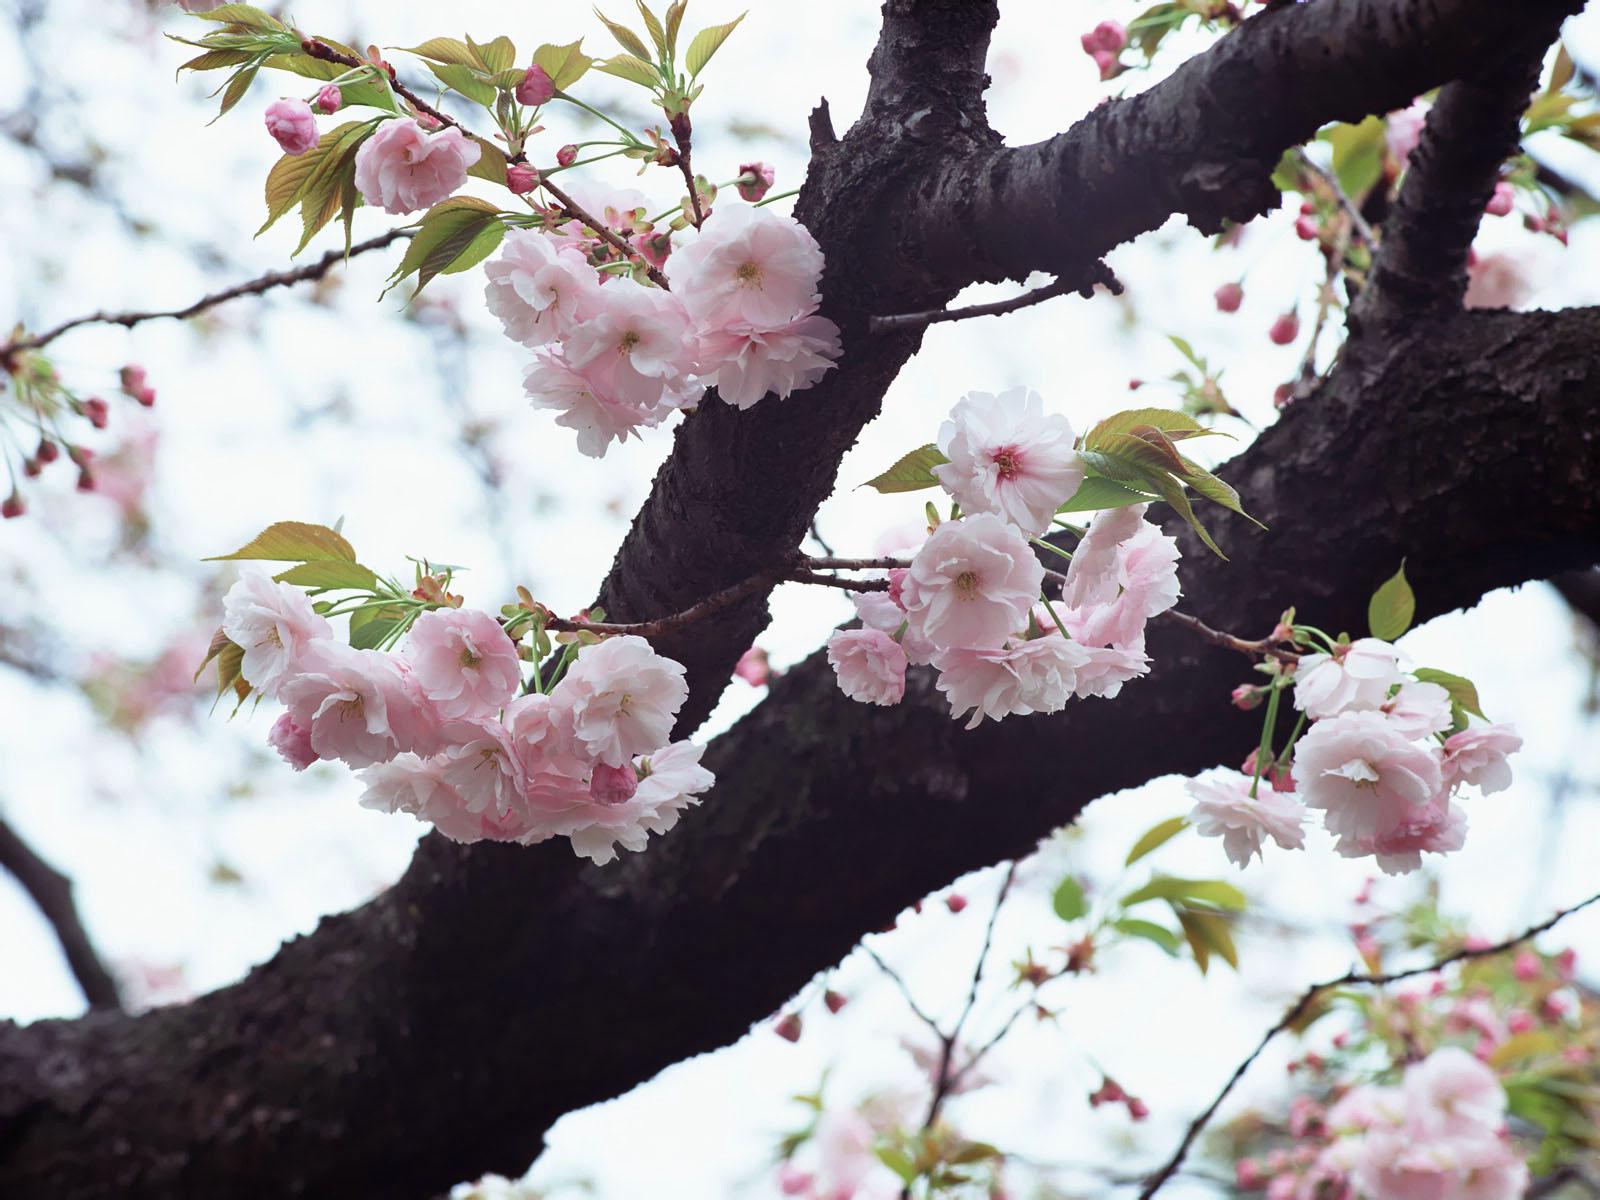 http://4.bp.blogspot.com/-fbNCOKfYqWI/UQJQEqT3ySI/AAAAAAAAKN4/uNG41slxPzI/s1600/hinh-nen-hd-dep-hoa-anh-dao-Japanese_nice_wallpapers-windows-8_xuan-2013-_121_EZ193.jpg